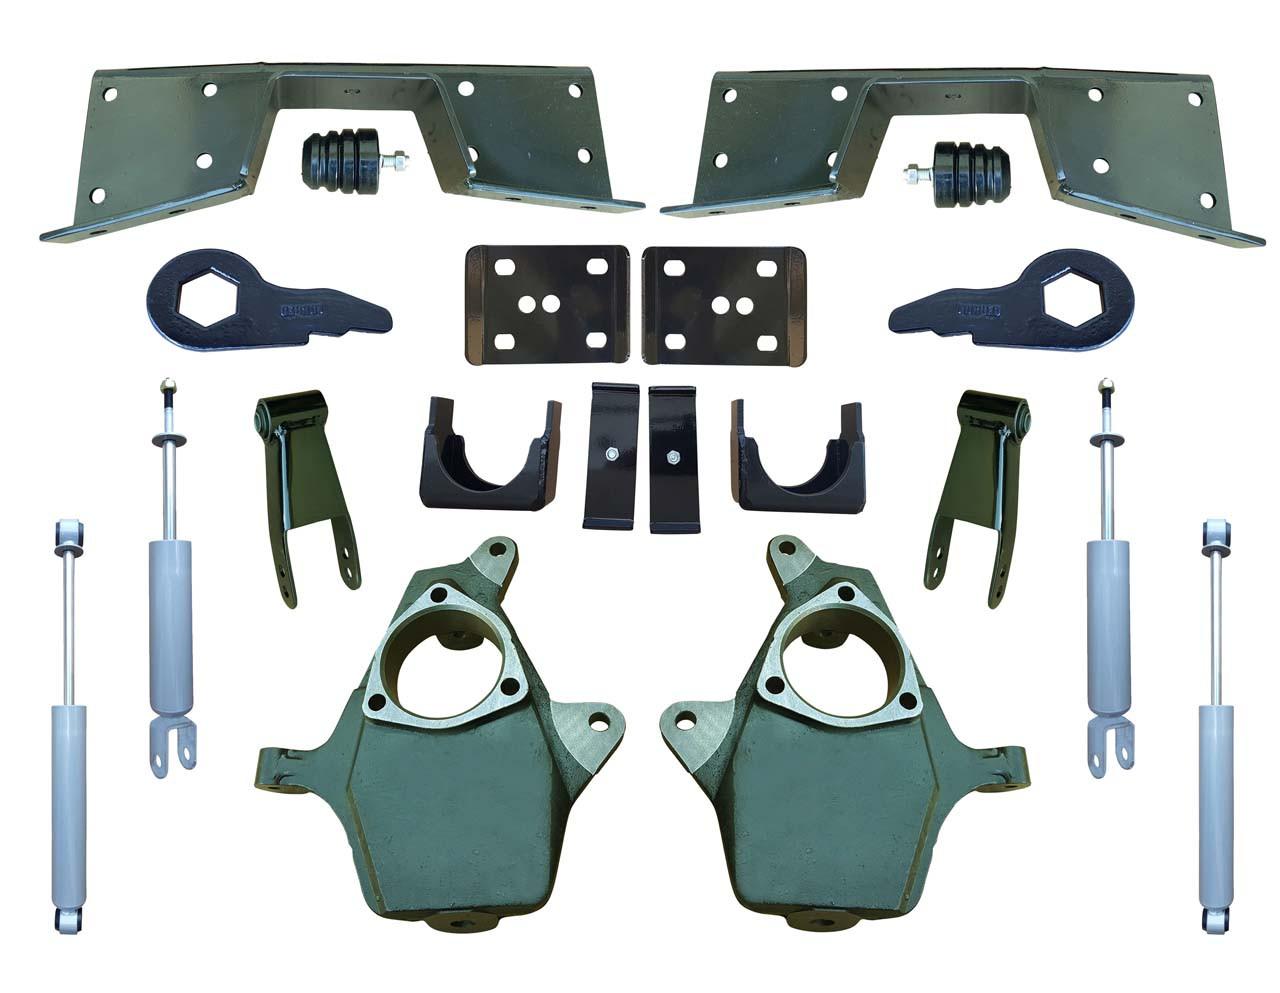 Complete 4-5/7 Lowering Kit for 01-06 Silverado / Sierra 4WD